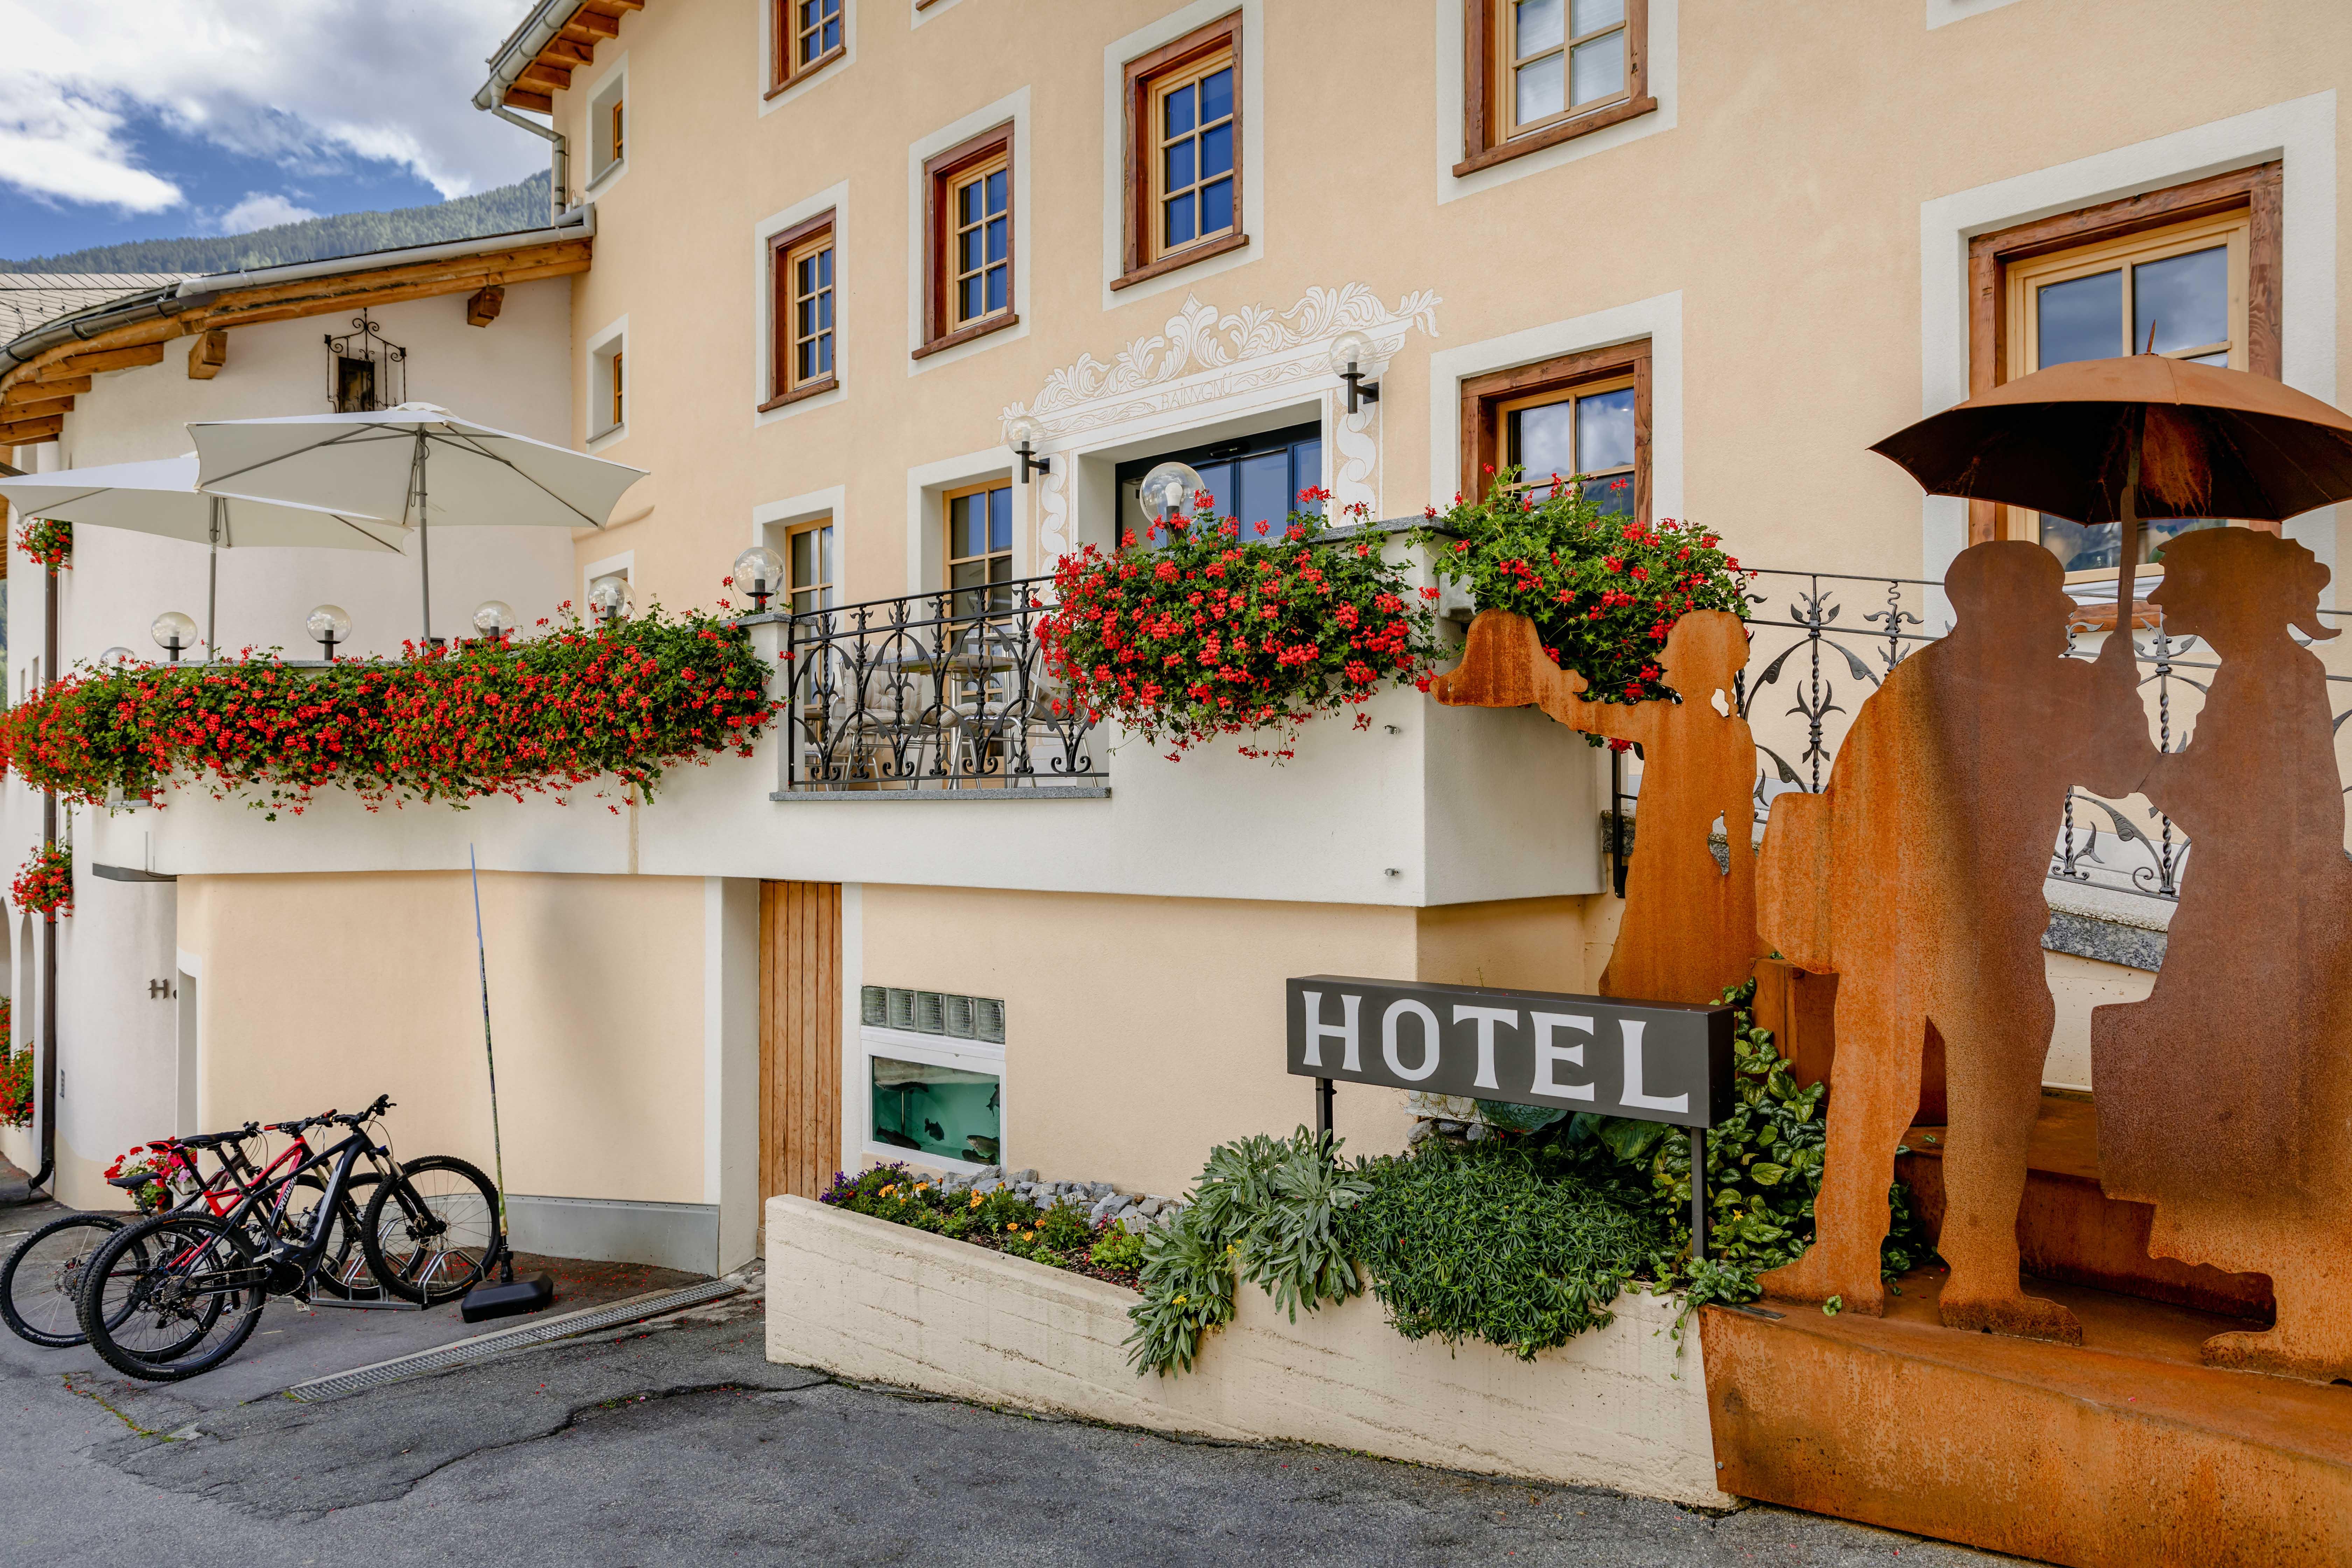 Hotel_Helvetia_Eingang